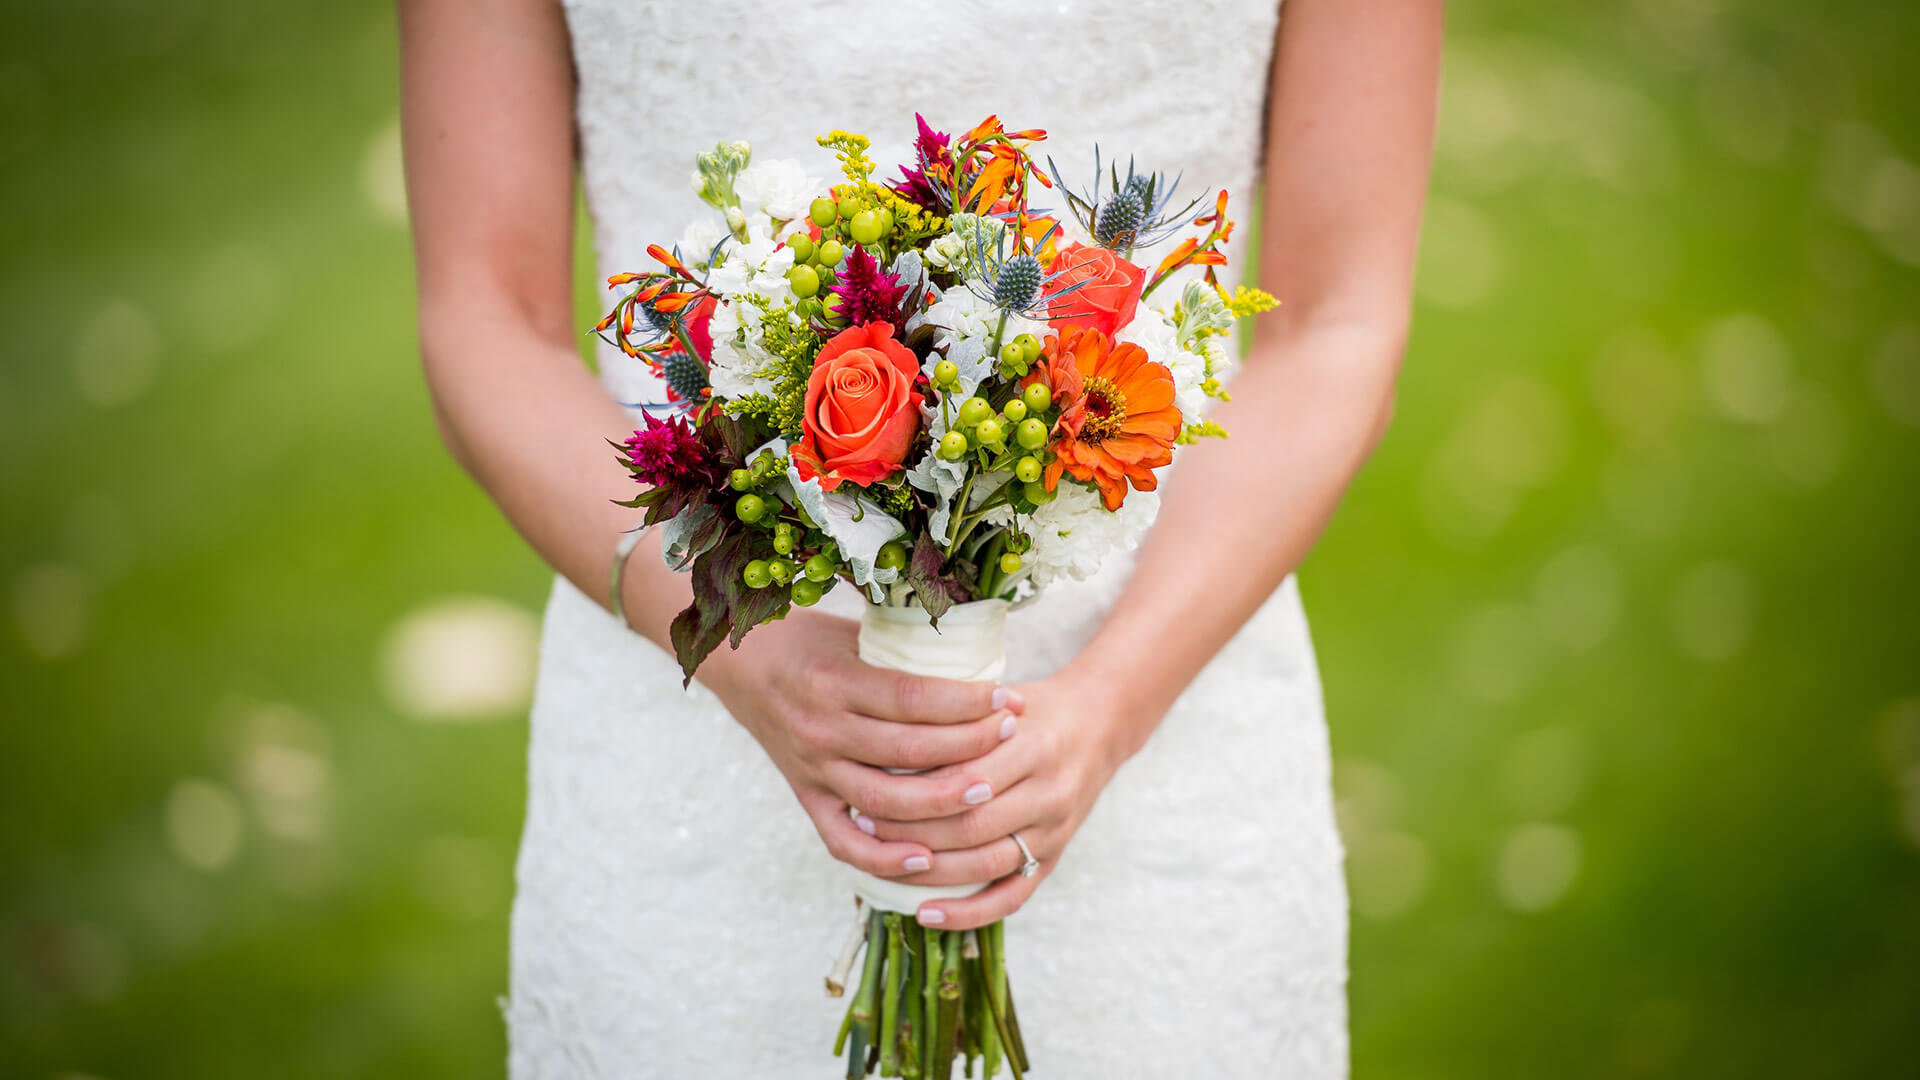 Gorgeous bouquet for the bride